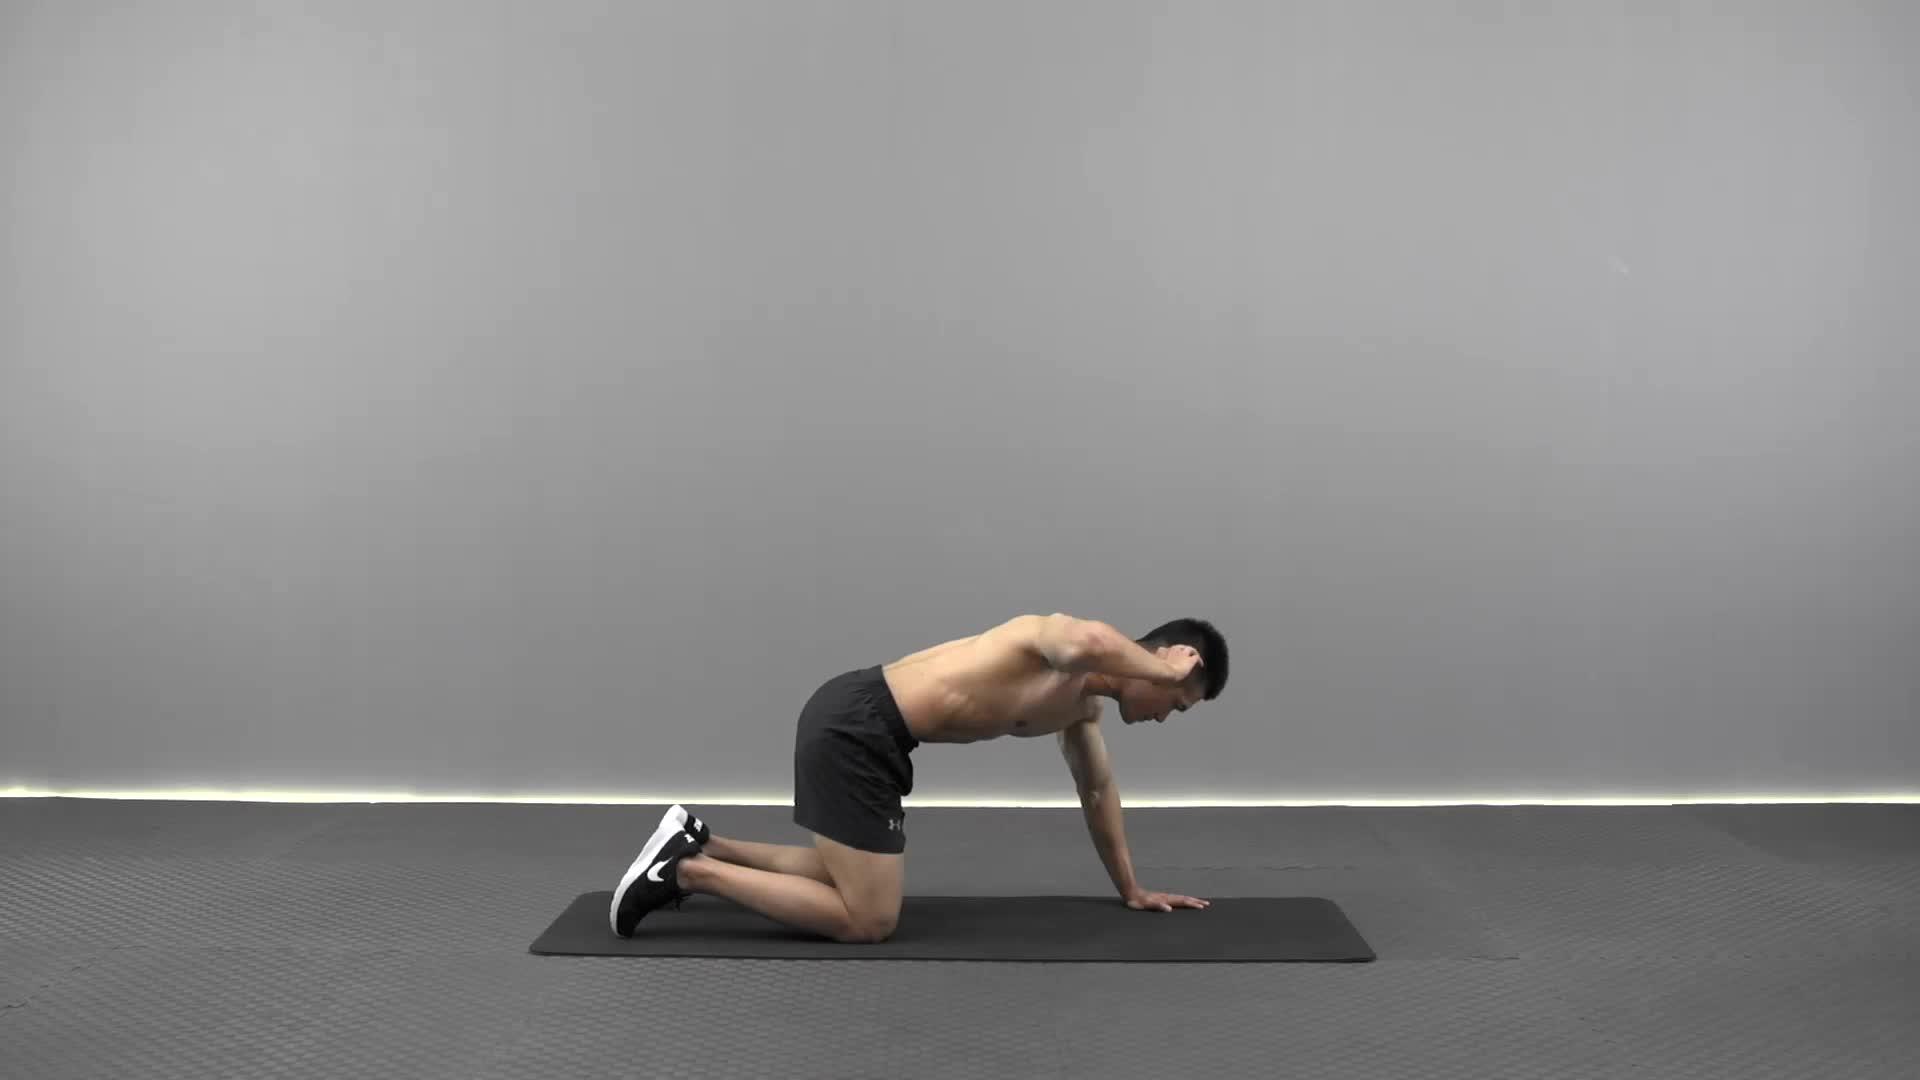 胸椎穩定運動 R